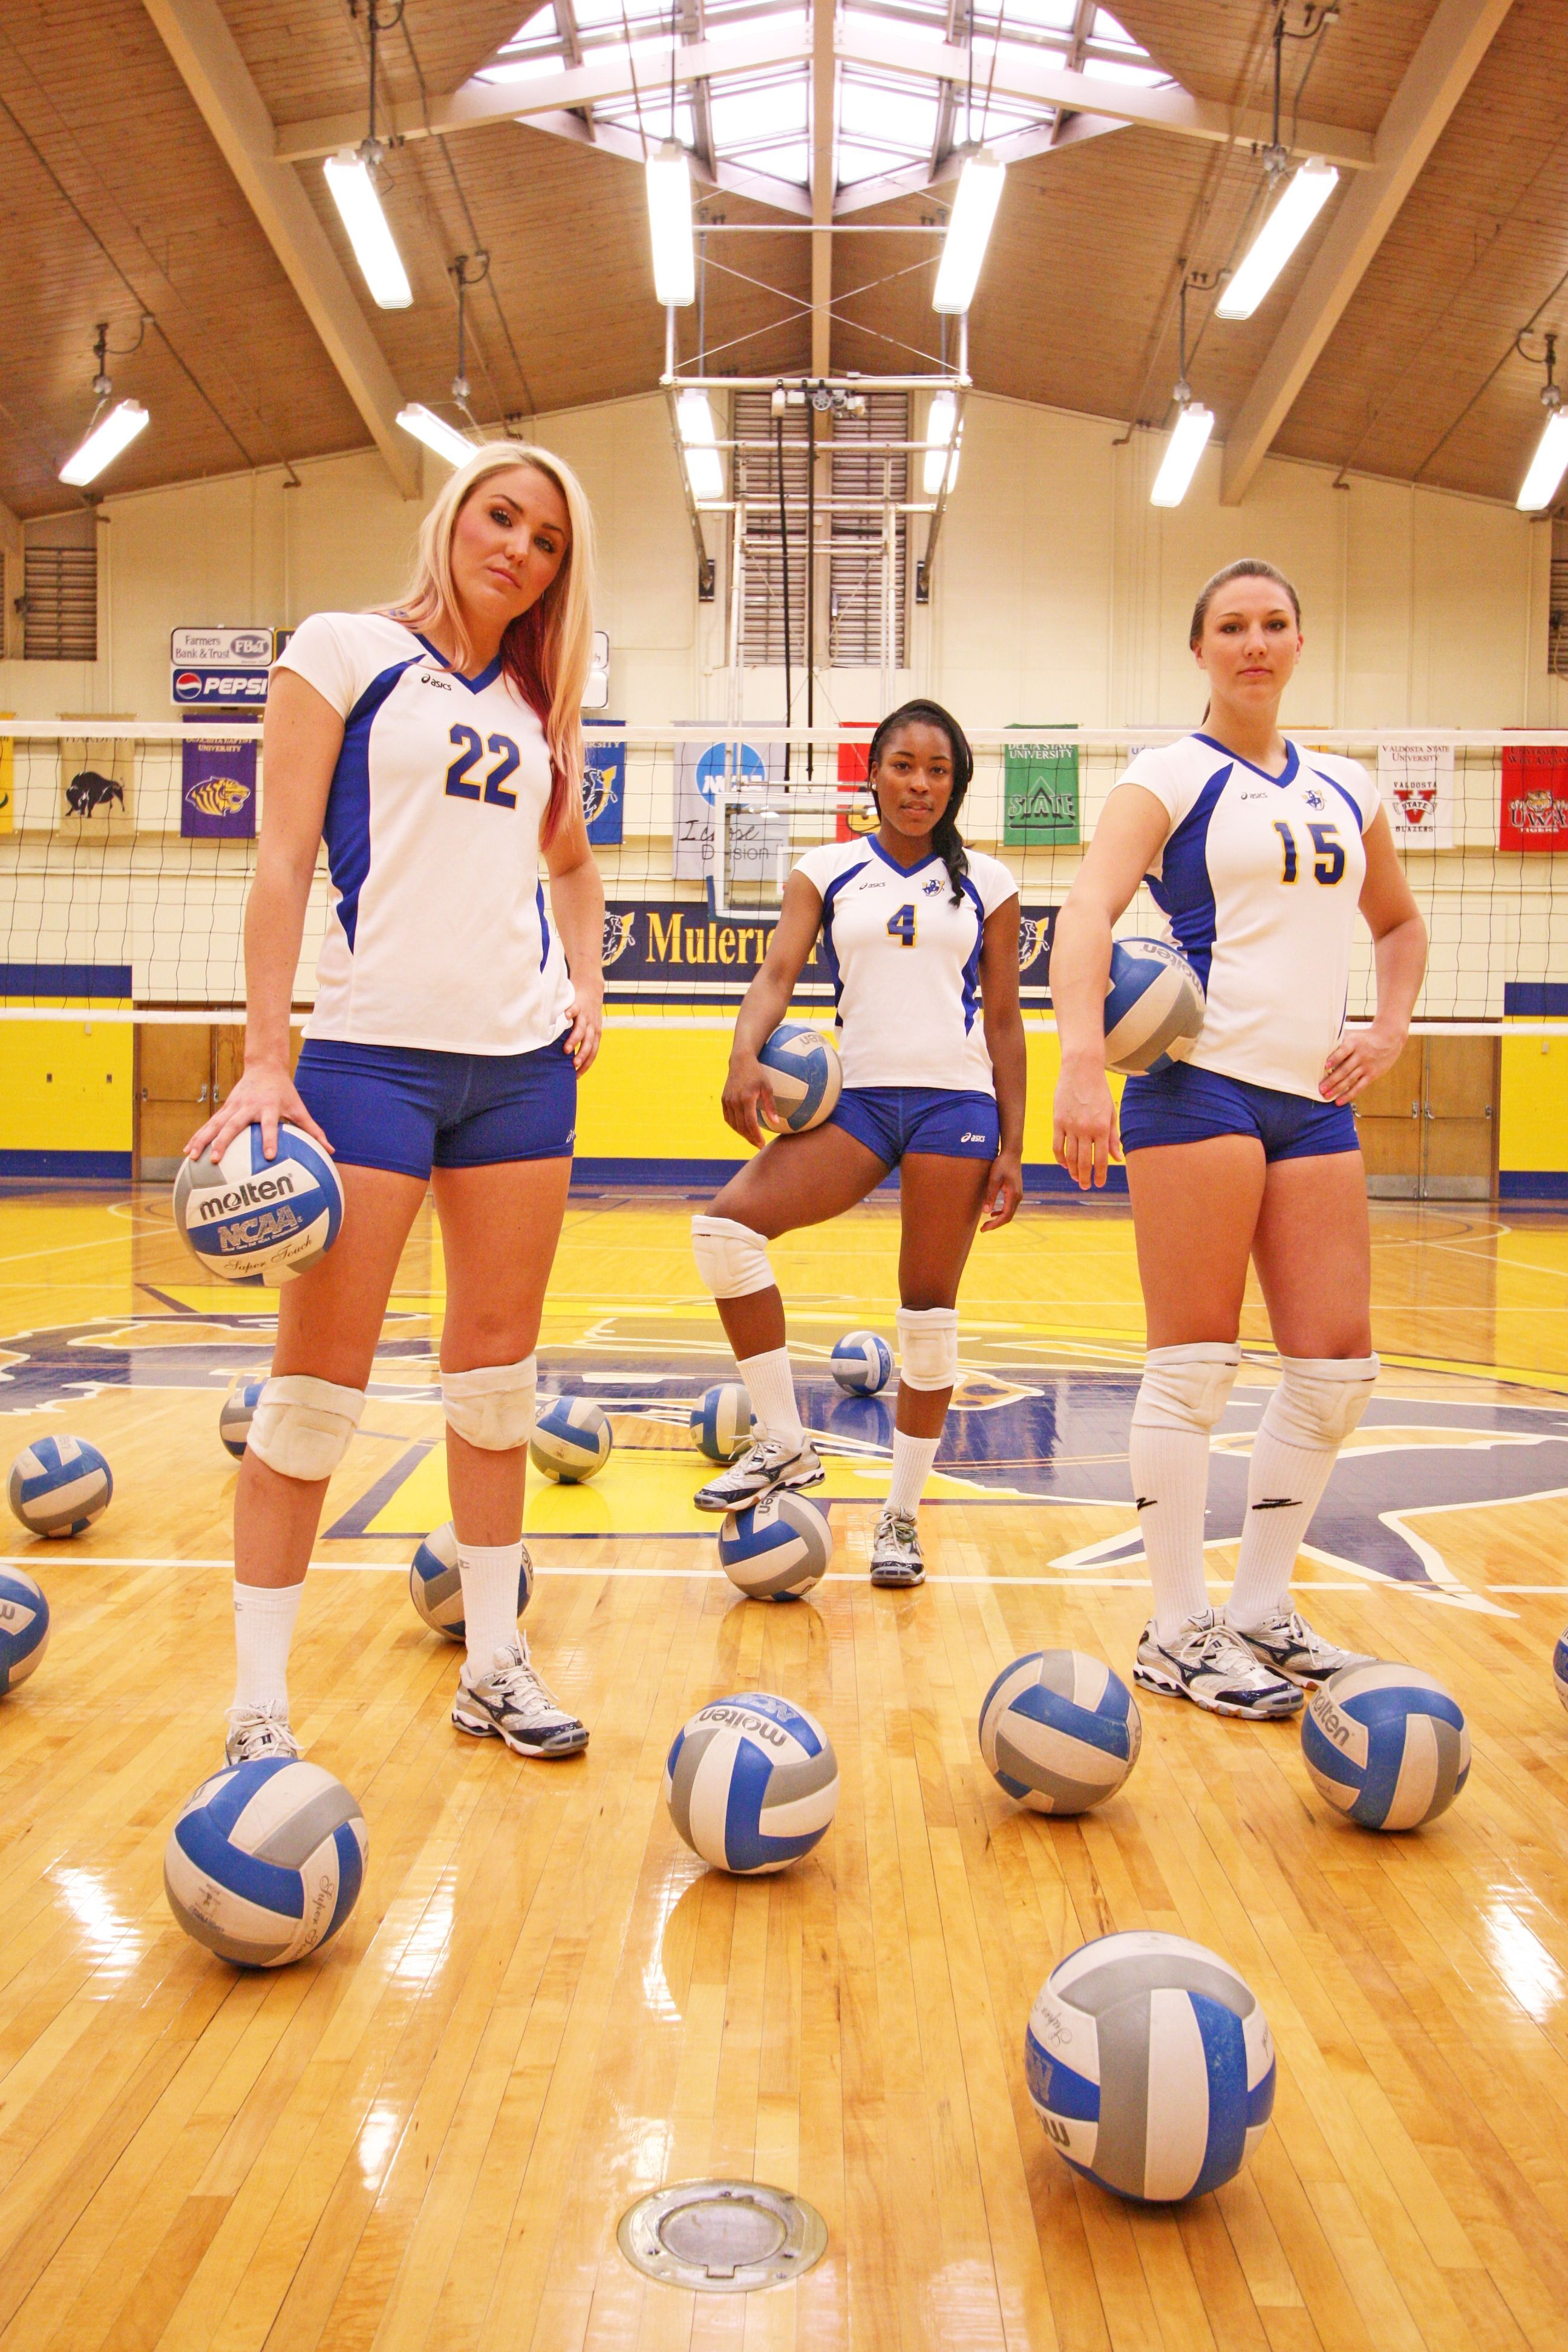 Lindsey Wilcox Jordan White And Courtney Smith Pose For The Sau Viewbook Voleibol Uniformes Voley Jugadoras De Voleibol